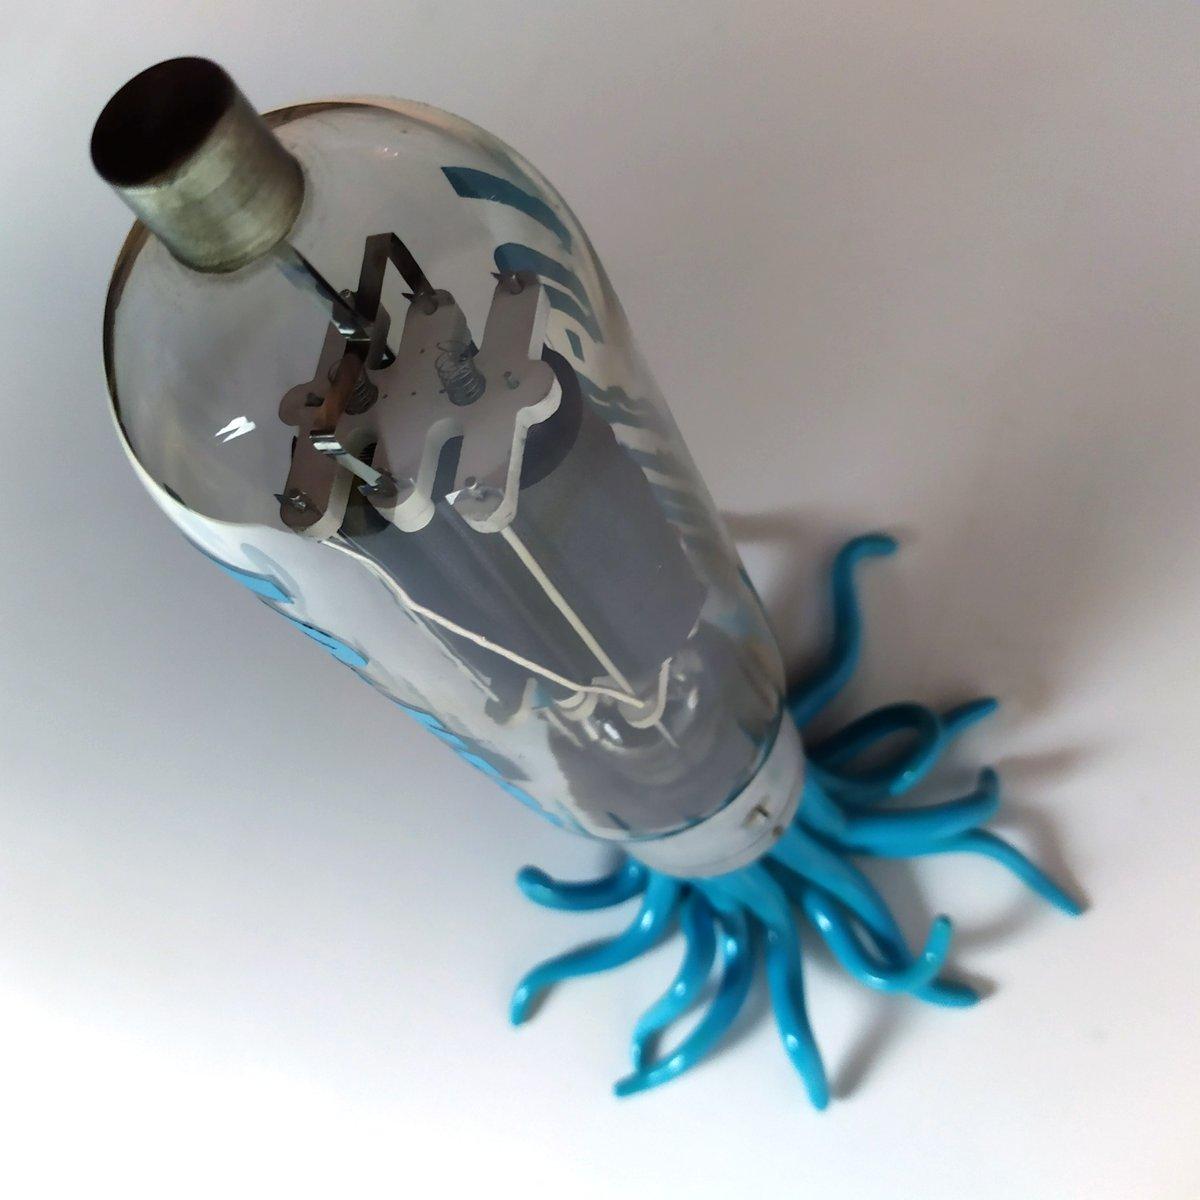 Image of IDEA-01